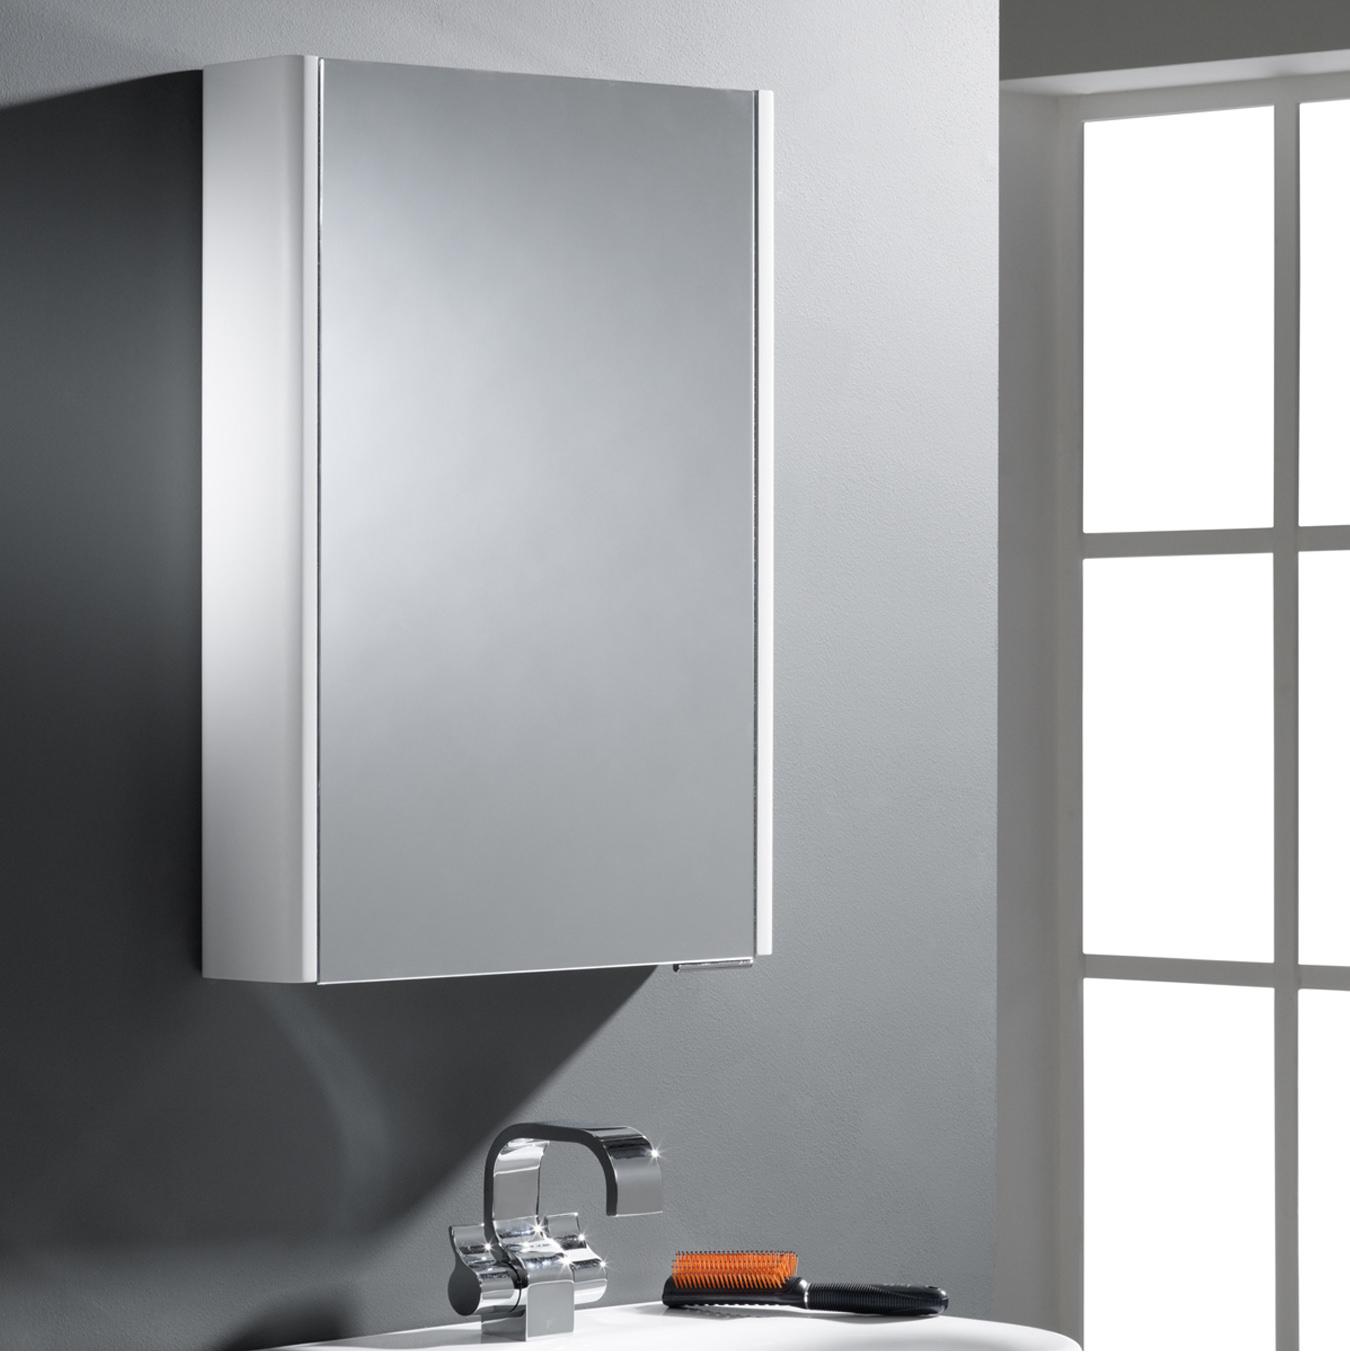 roper rhodes definition phase single mirror glass door cabinet